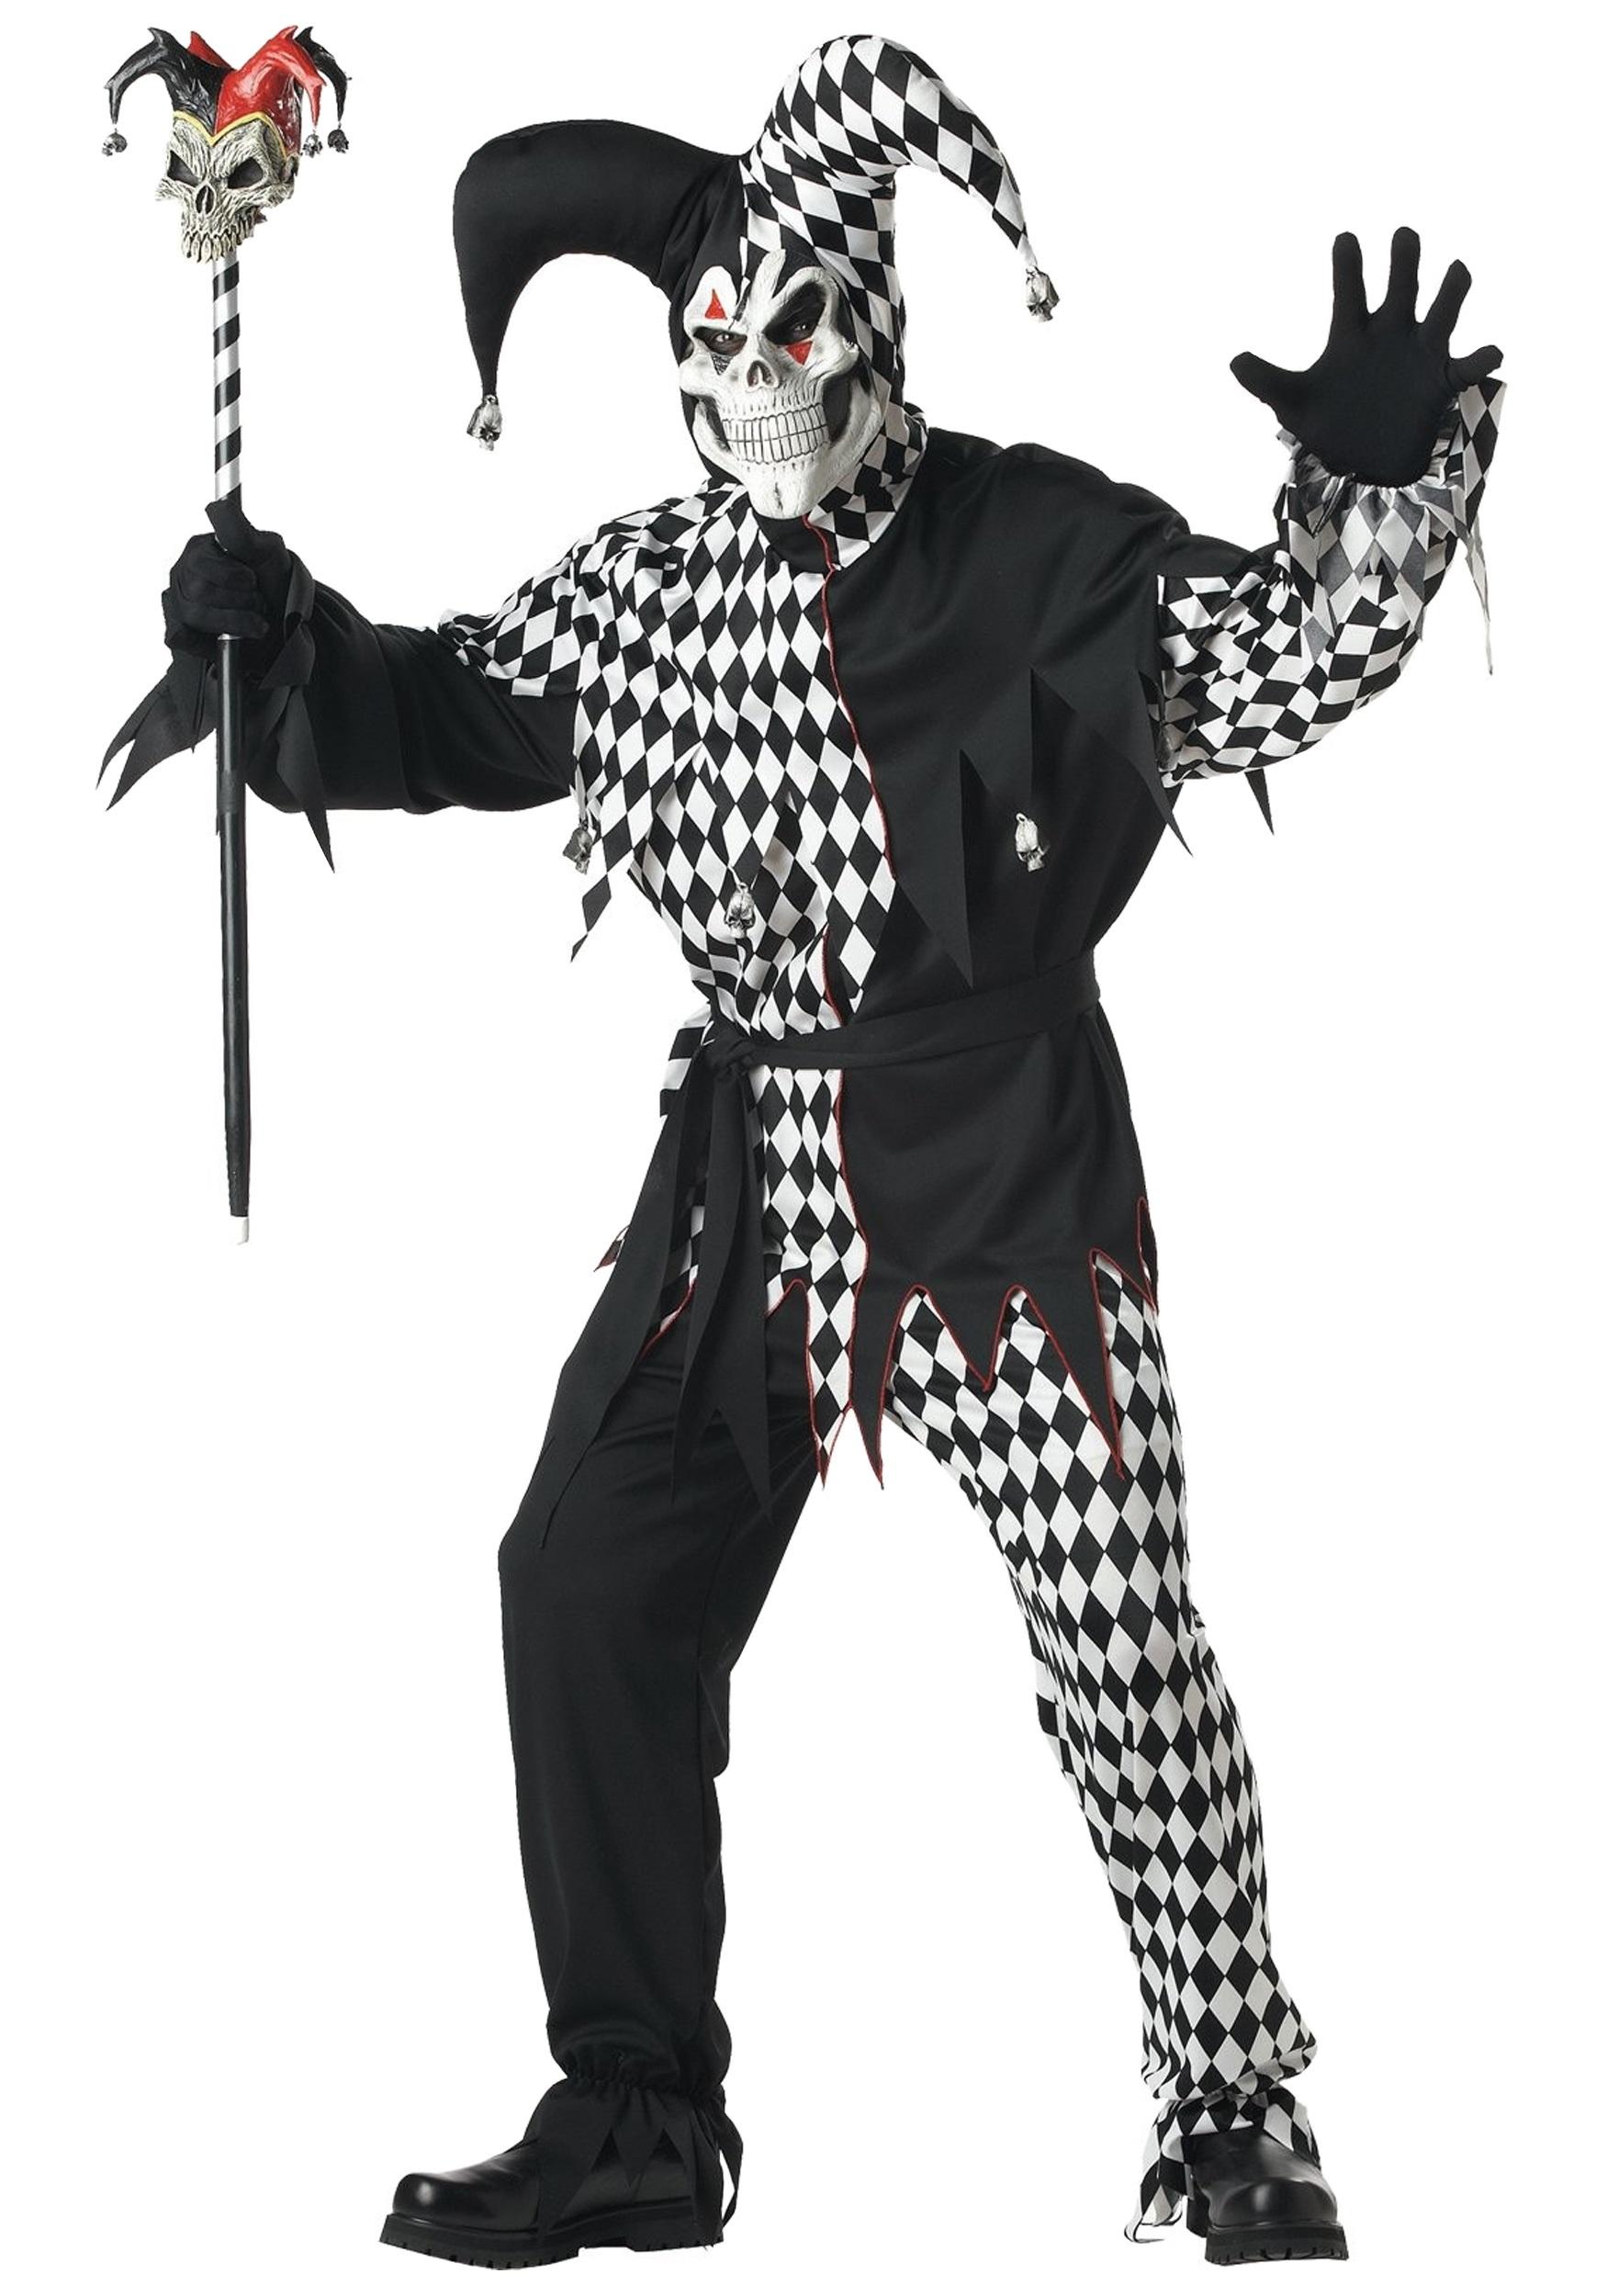 3 Ways to Celebrate Halloween - wikiHow